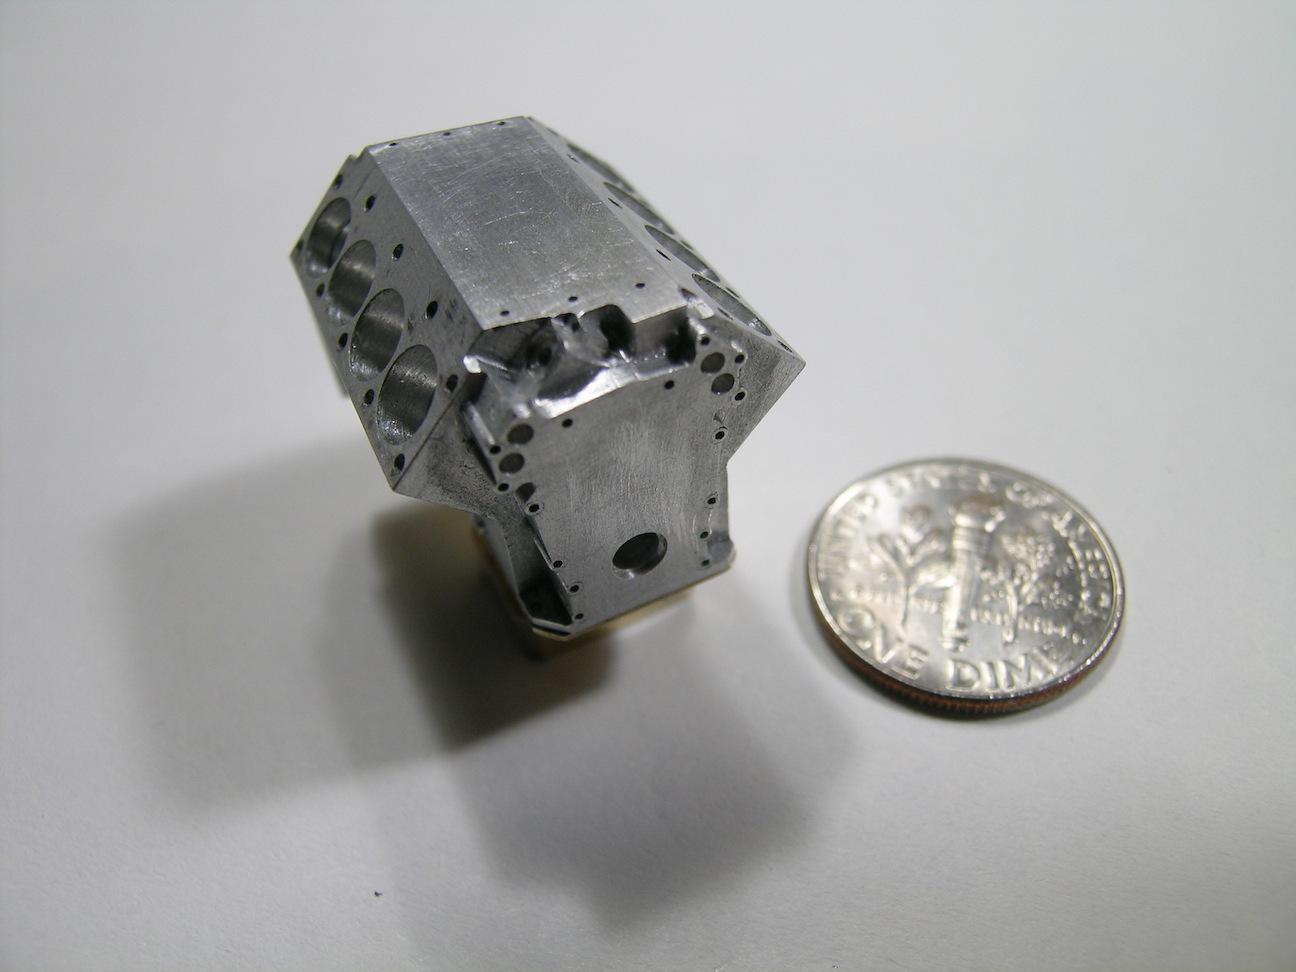 4b-EngineBlock.JPG.32139e65a6f02c33387e83ec1c79aa40.JPG